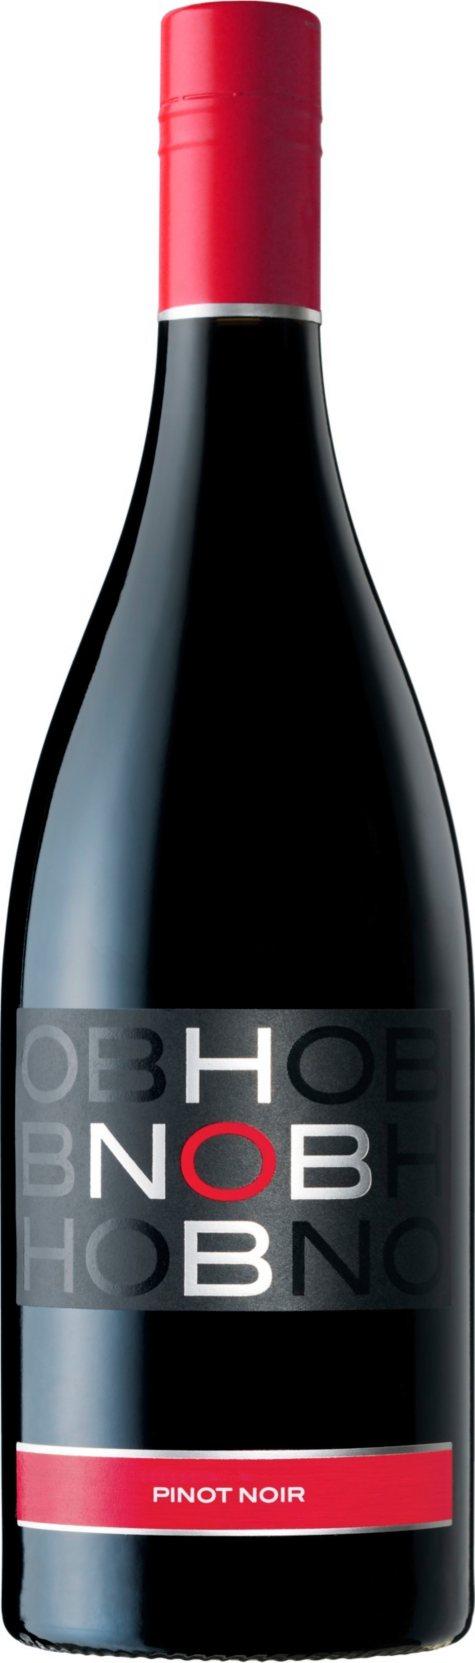 Hob Nob Pinot Noir (750ML)